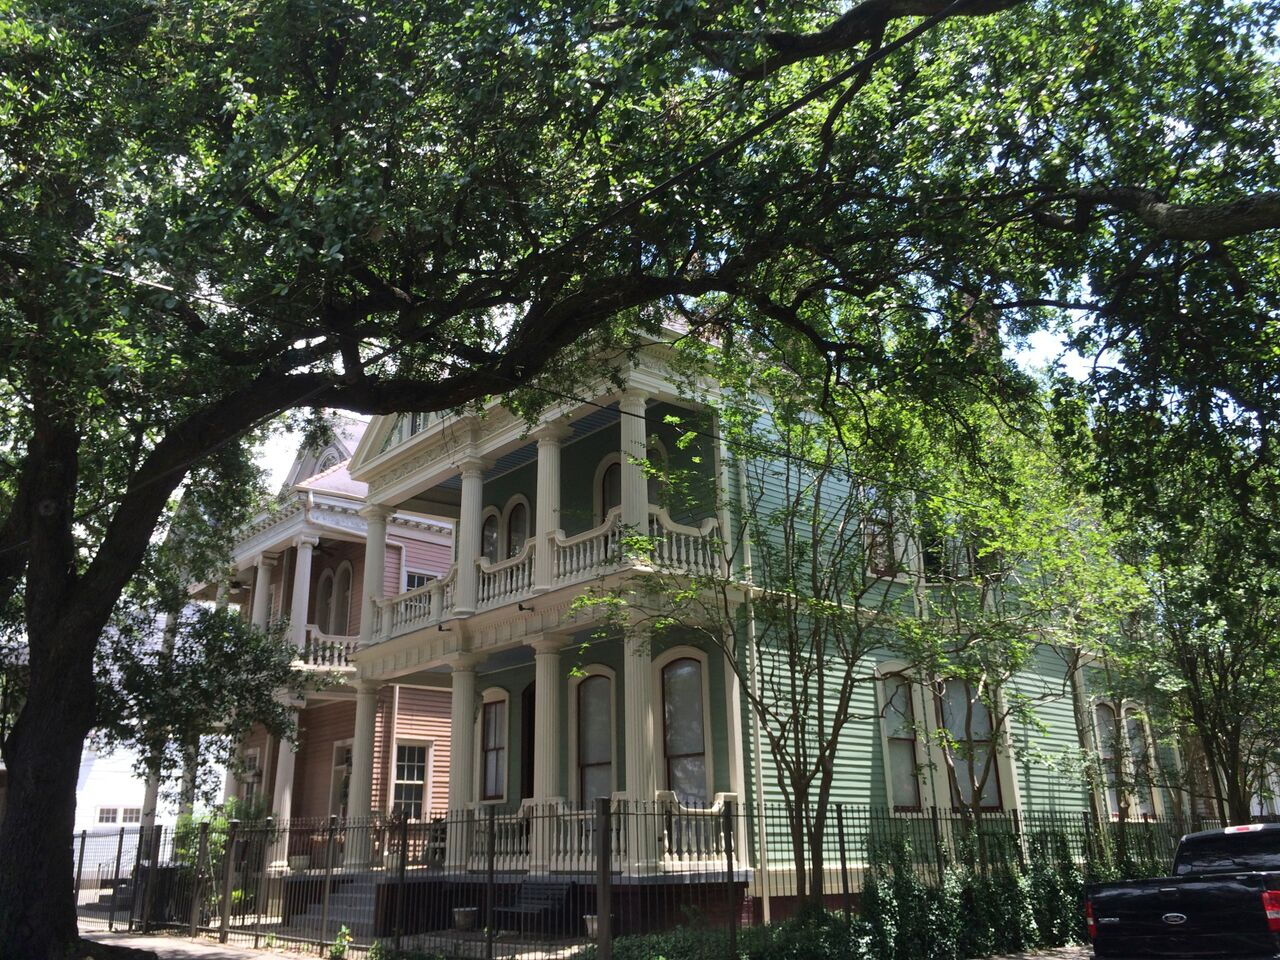 New Orleans Beyond Bourbon Street Seven West Travel Club